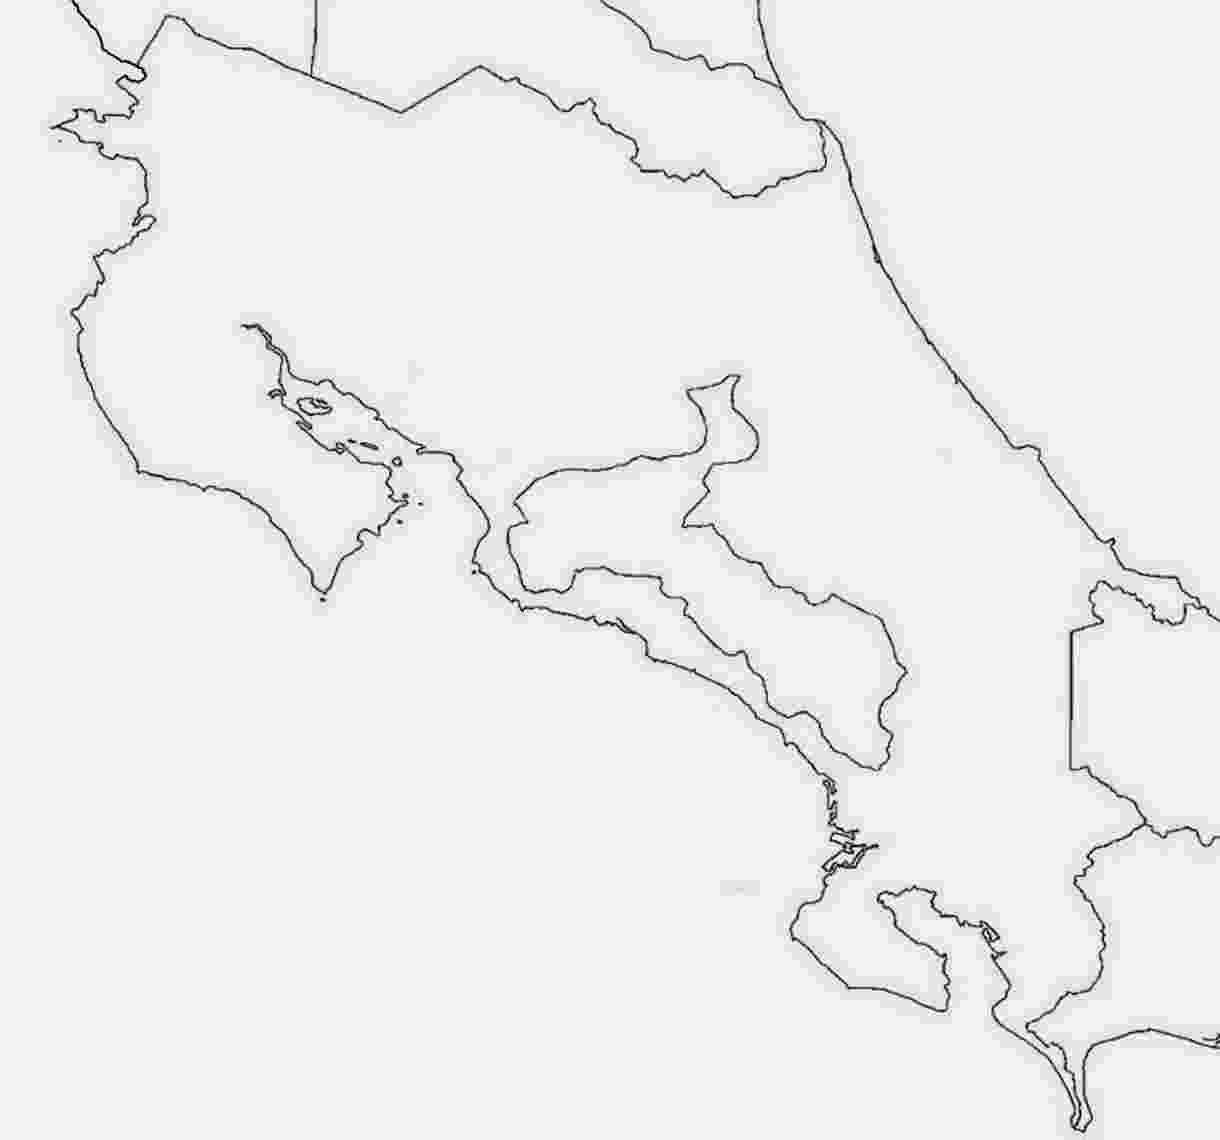 mapa de centroamerica ver mapa de centro america centroamerica de mapa